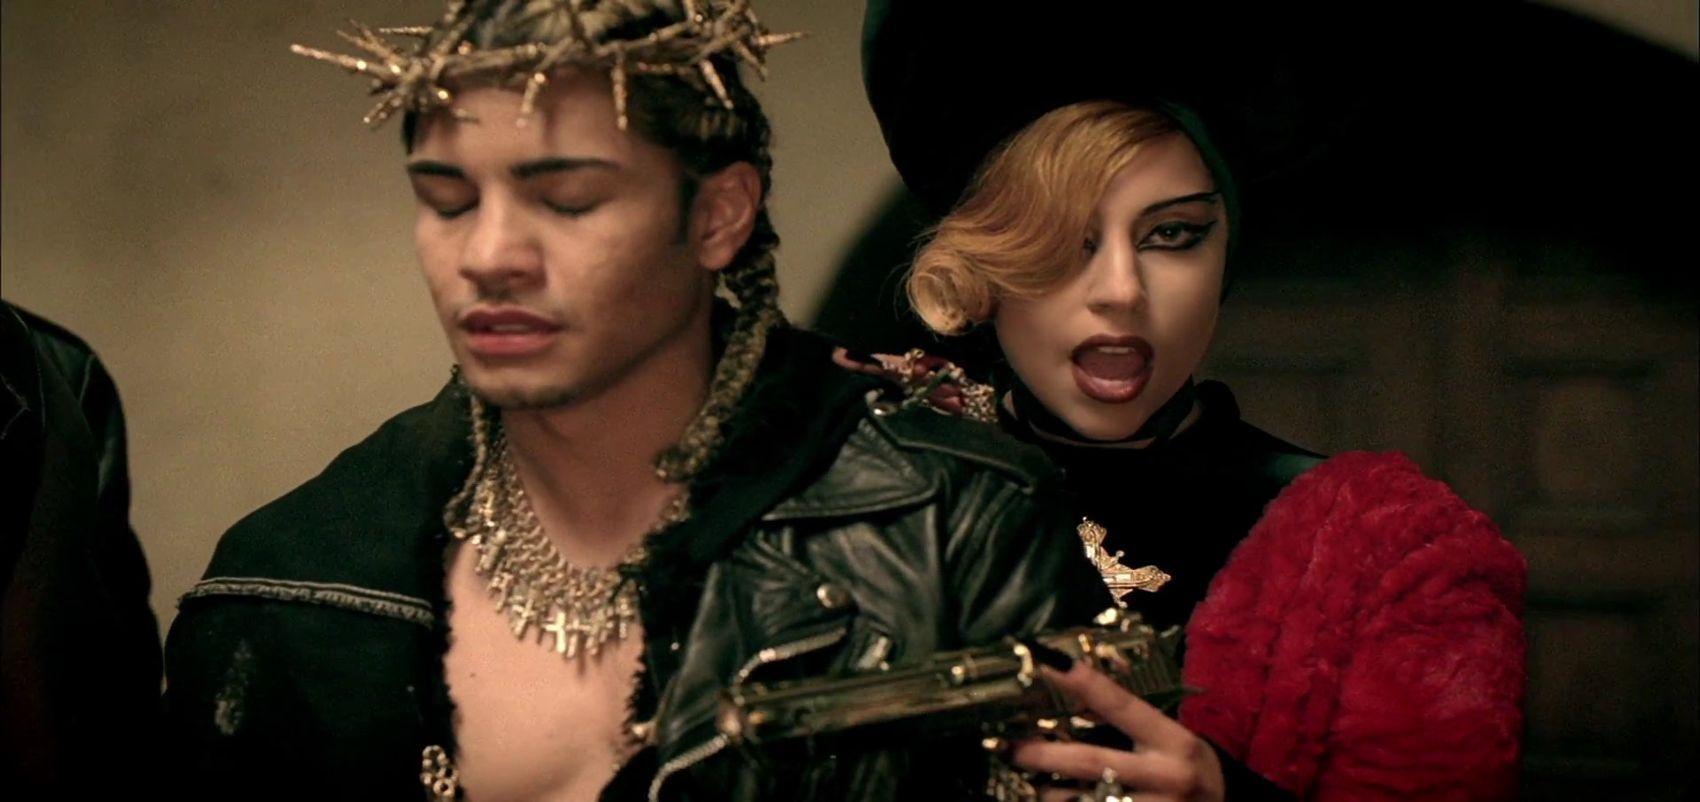 Lady Gaga - Judas - música Video